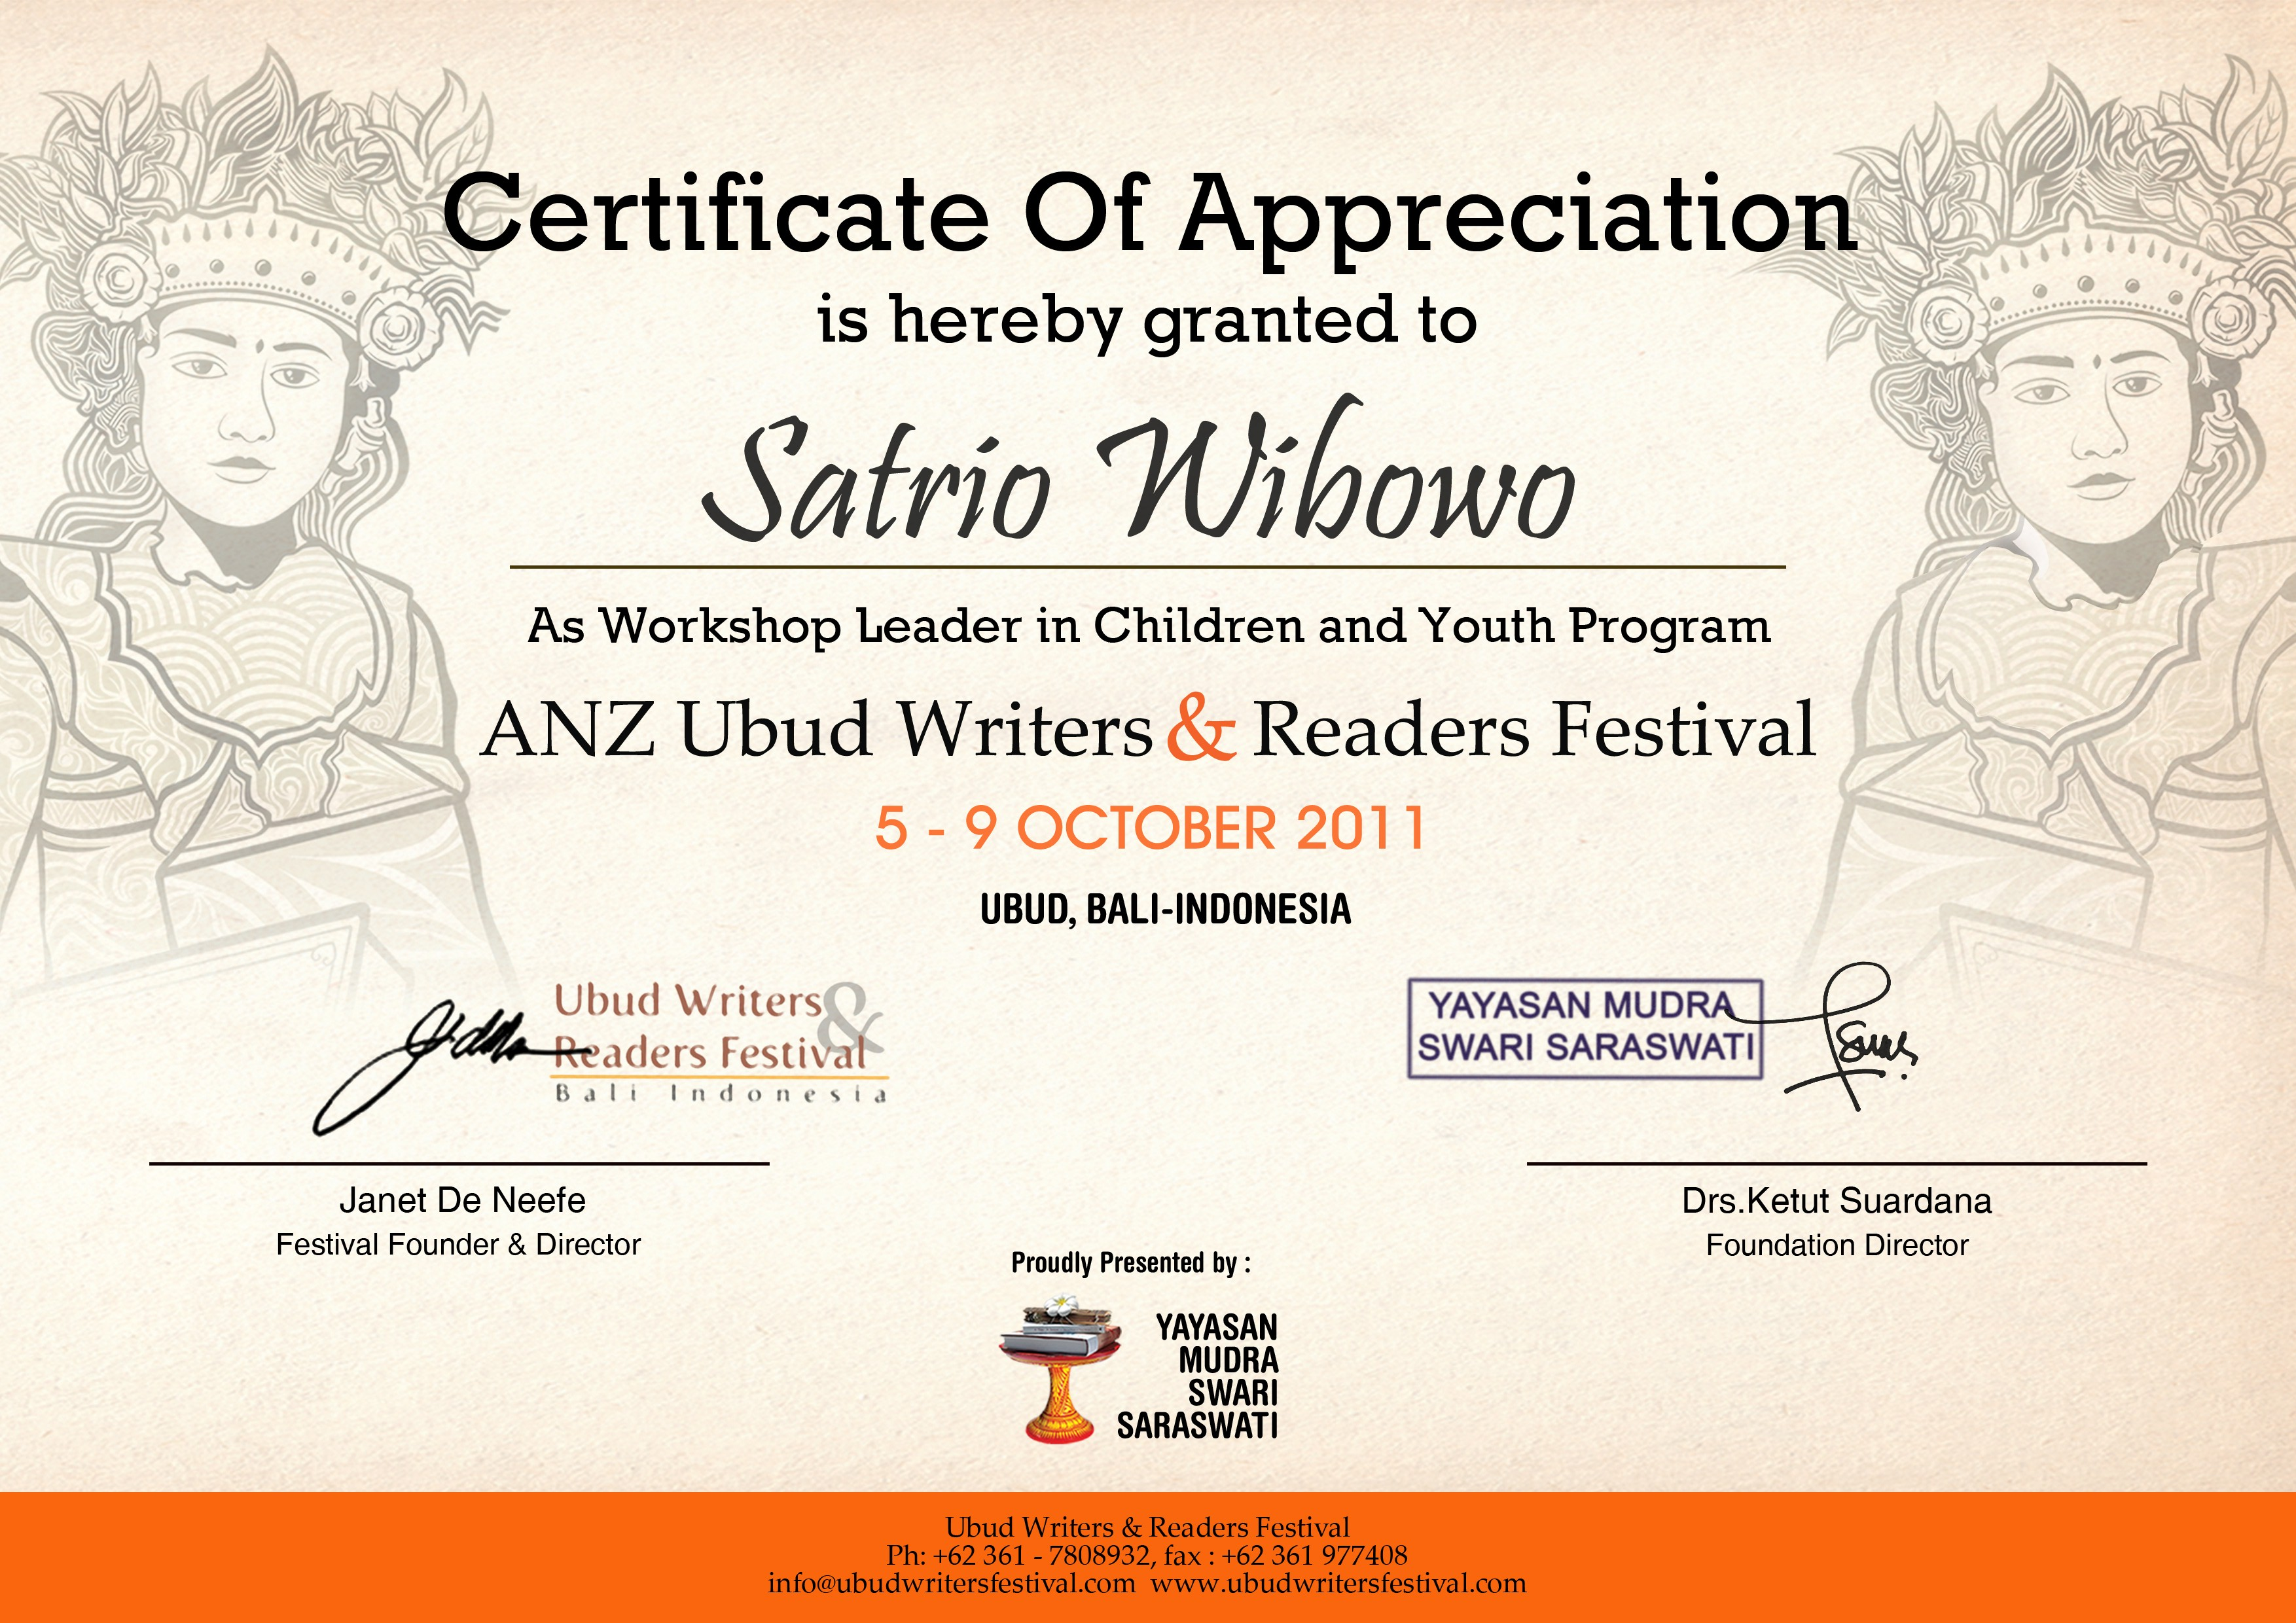 KENANGAN MENDAMPINGI SATRIO WIBOWO DI UBUD WRITERS READERS FESTIVAL 2011 oleh Yeni Sahnaz Kompasiana